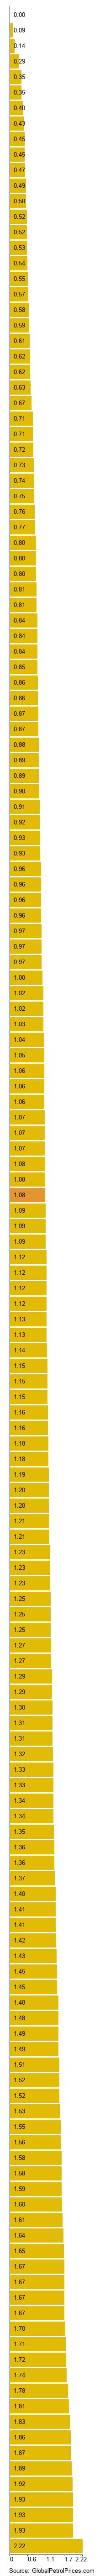 Guyana gasoline prices, 05-Aug-2019   GlobalPetrolPrices com